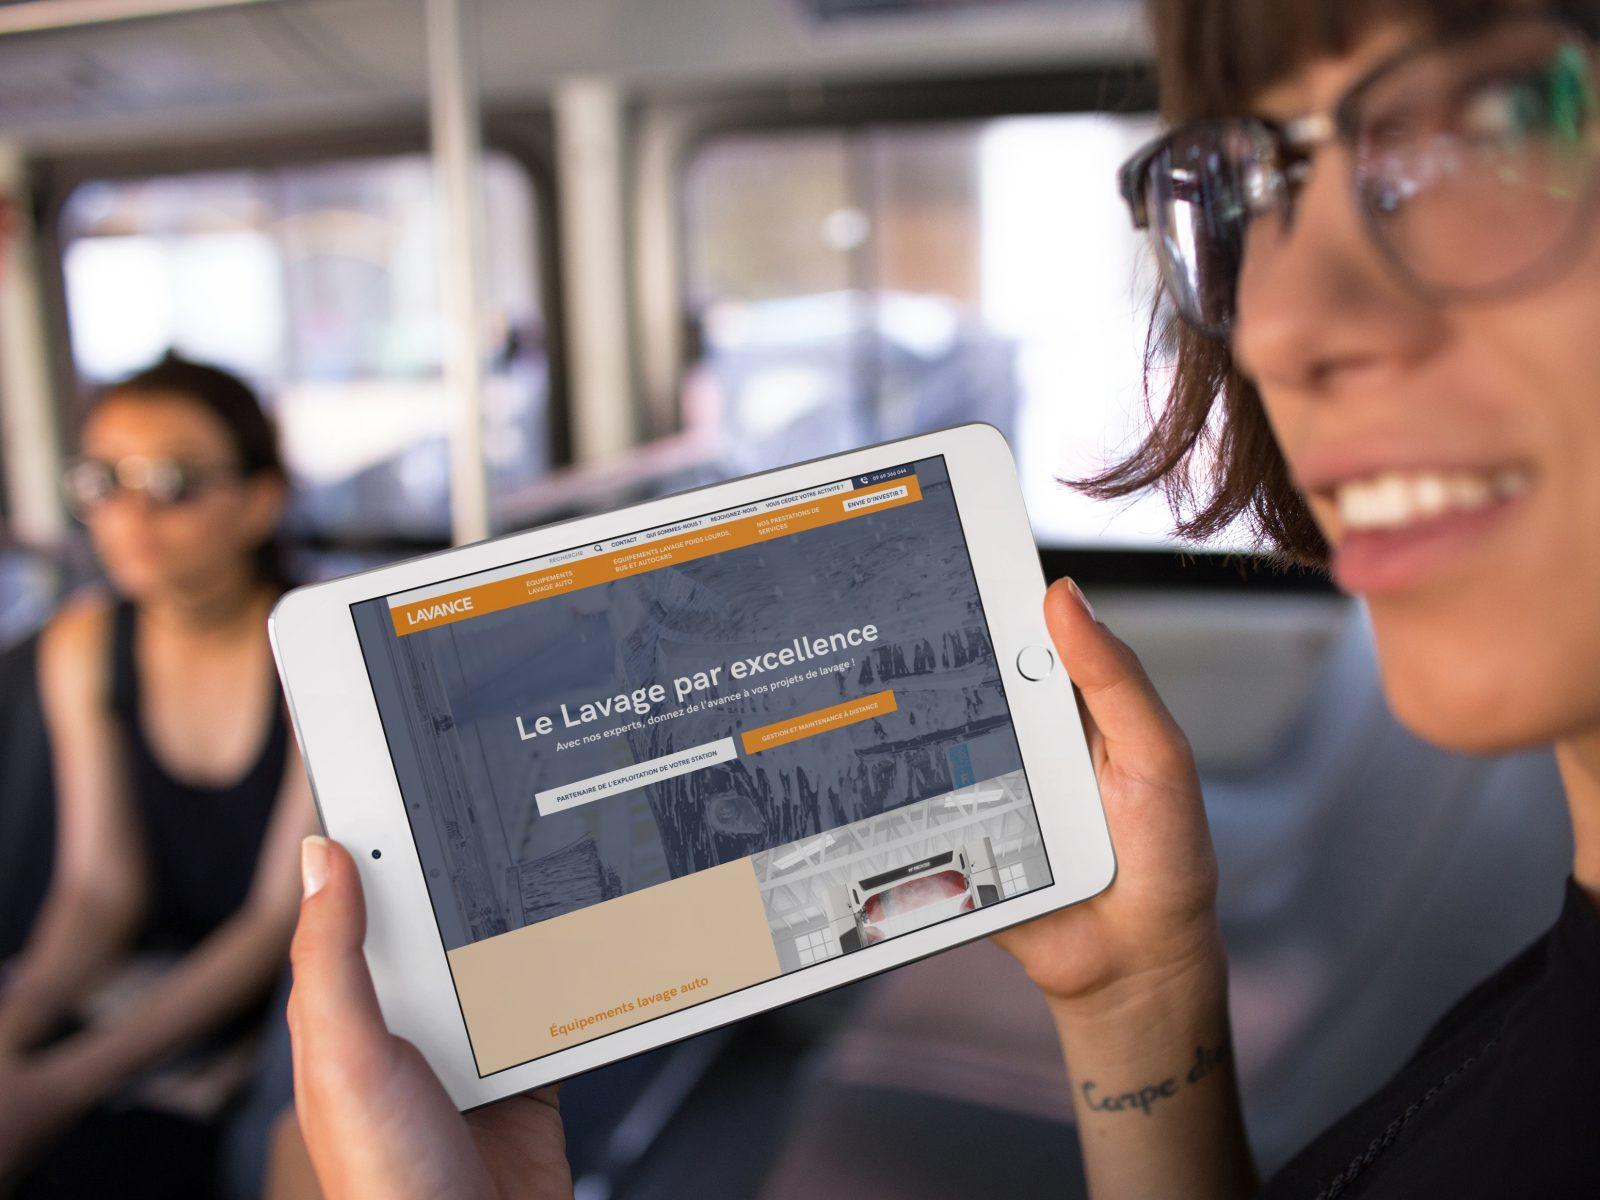 LunaWeb, Developpement Back-end : Boutique en ligne